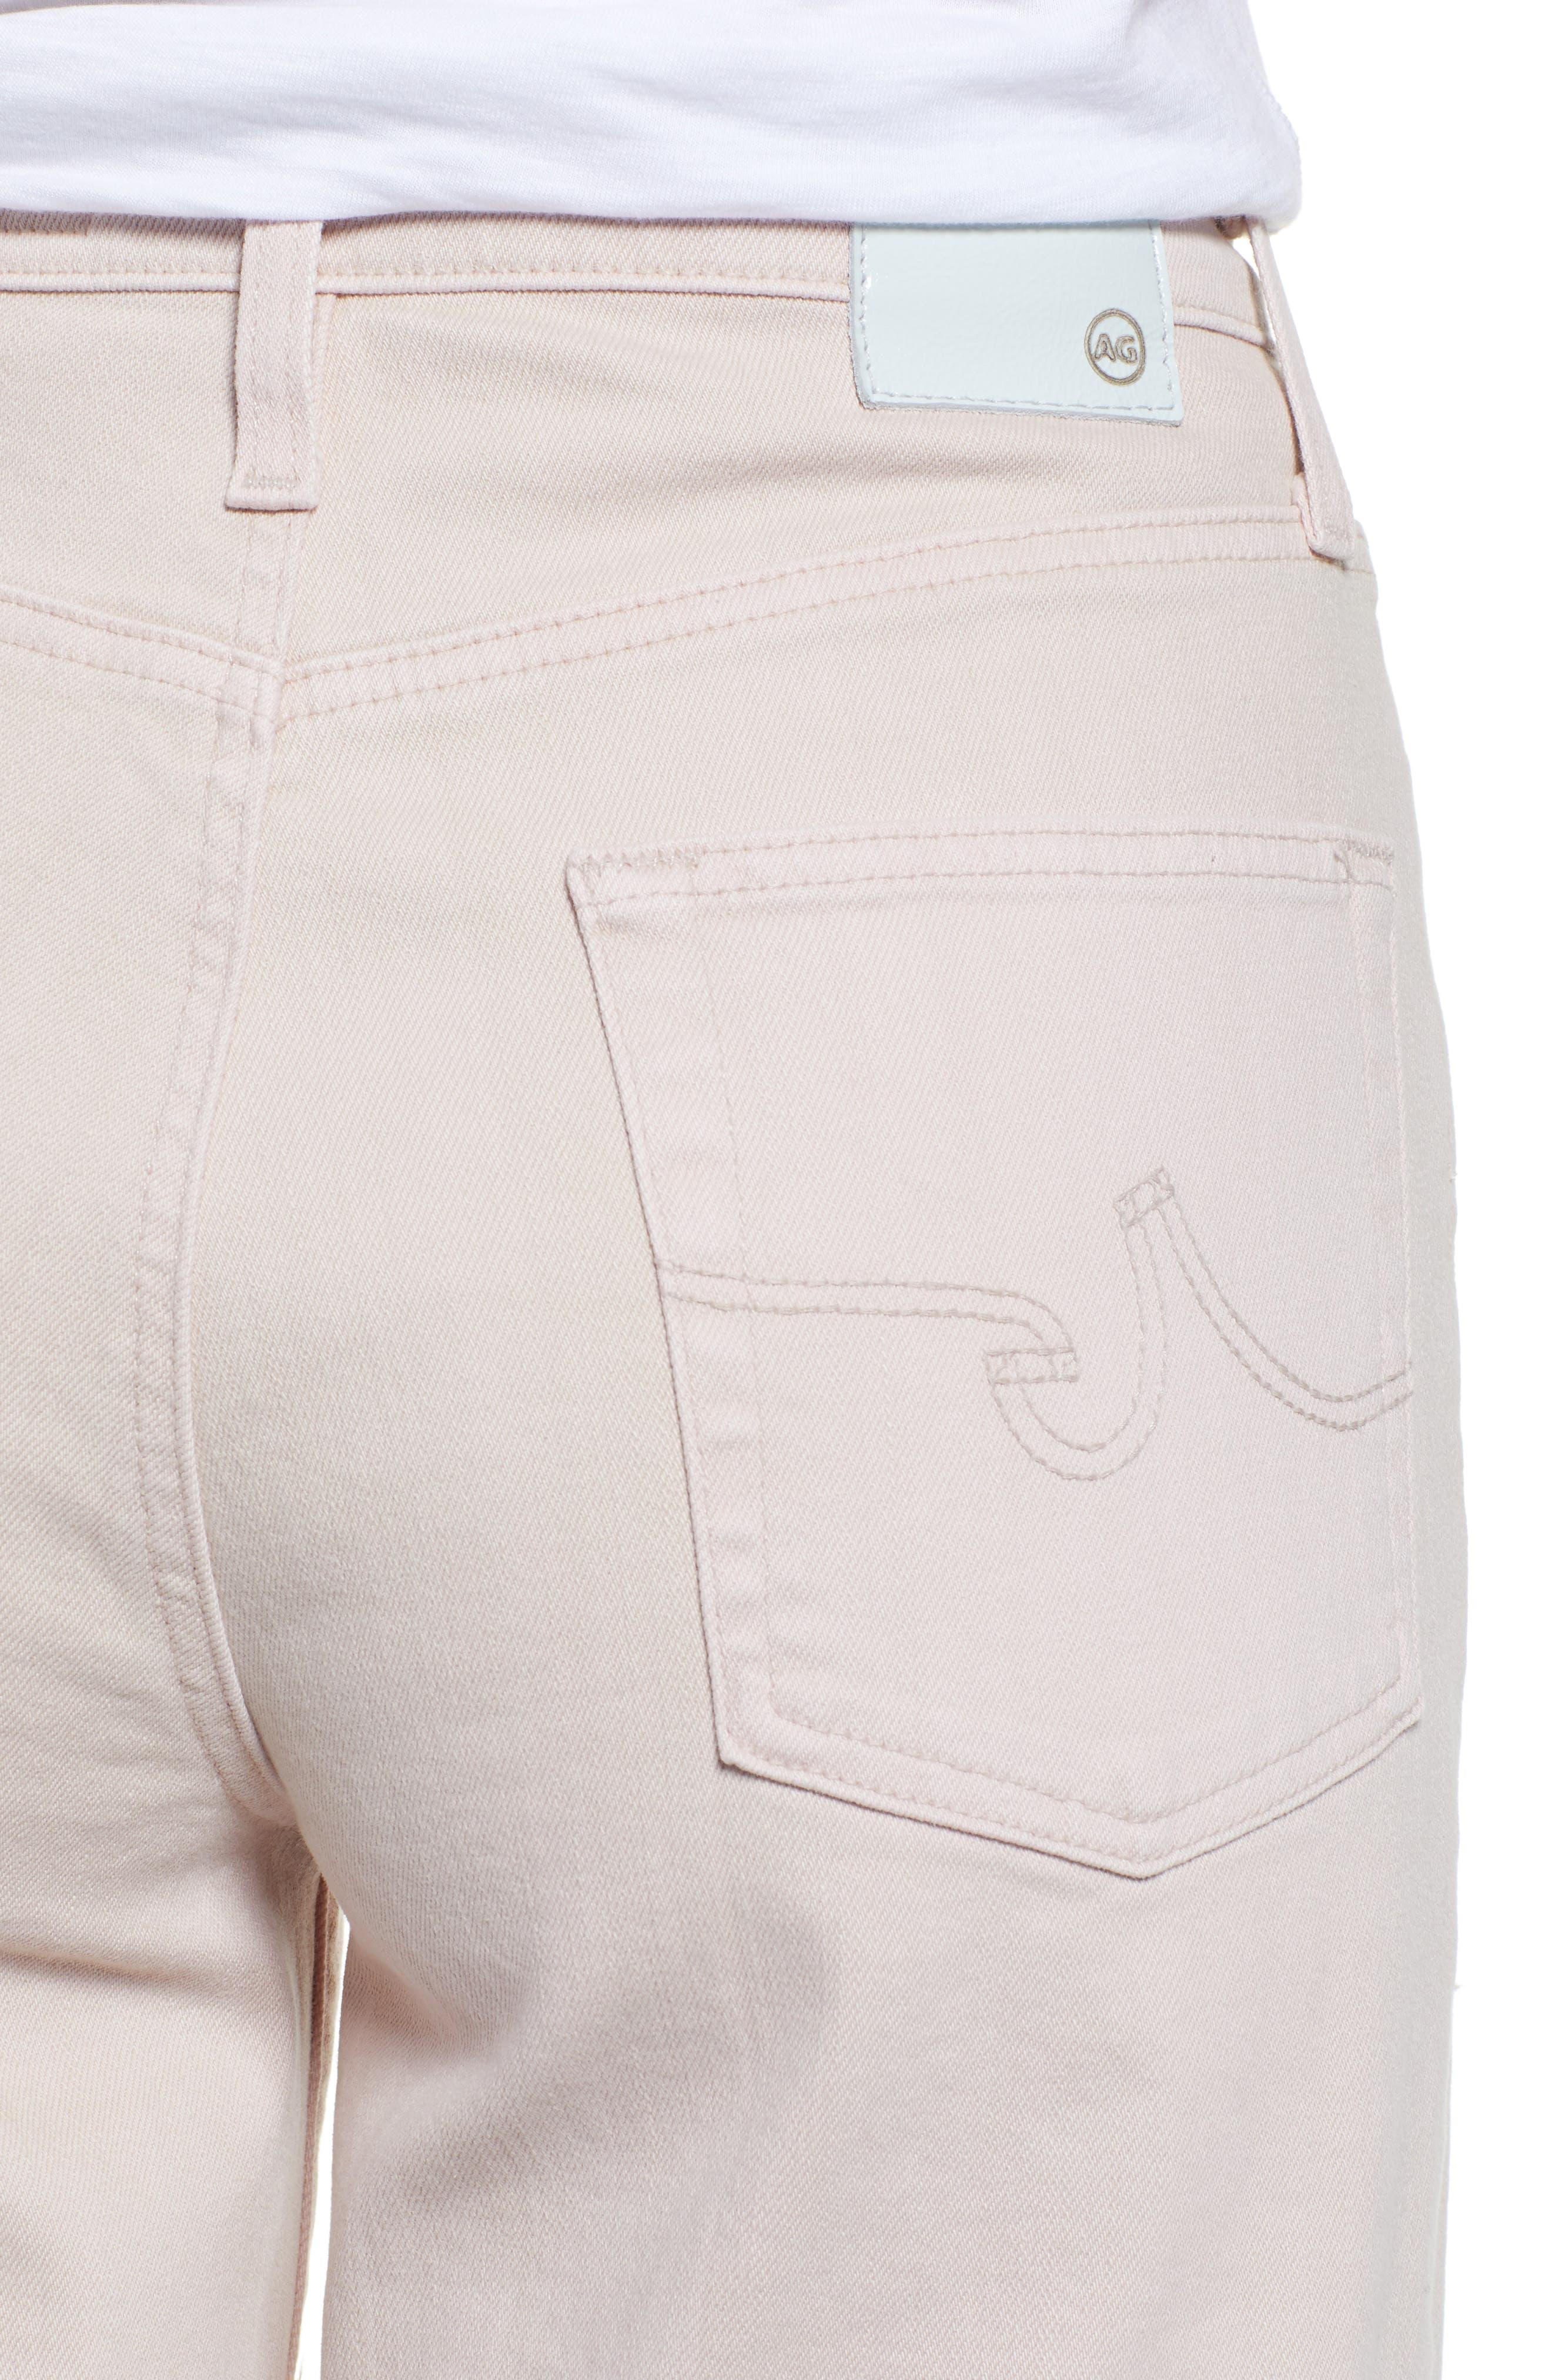 AG, Etta High Waist Crop Wide Leg Jeans, Alternate thumbnail 5, color, SULFUR PEAKED PINK